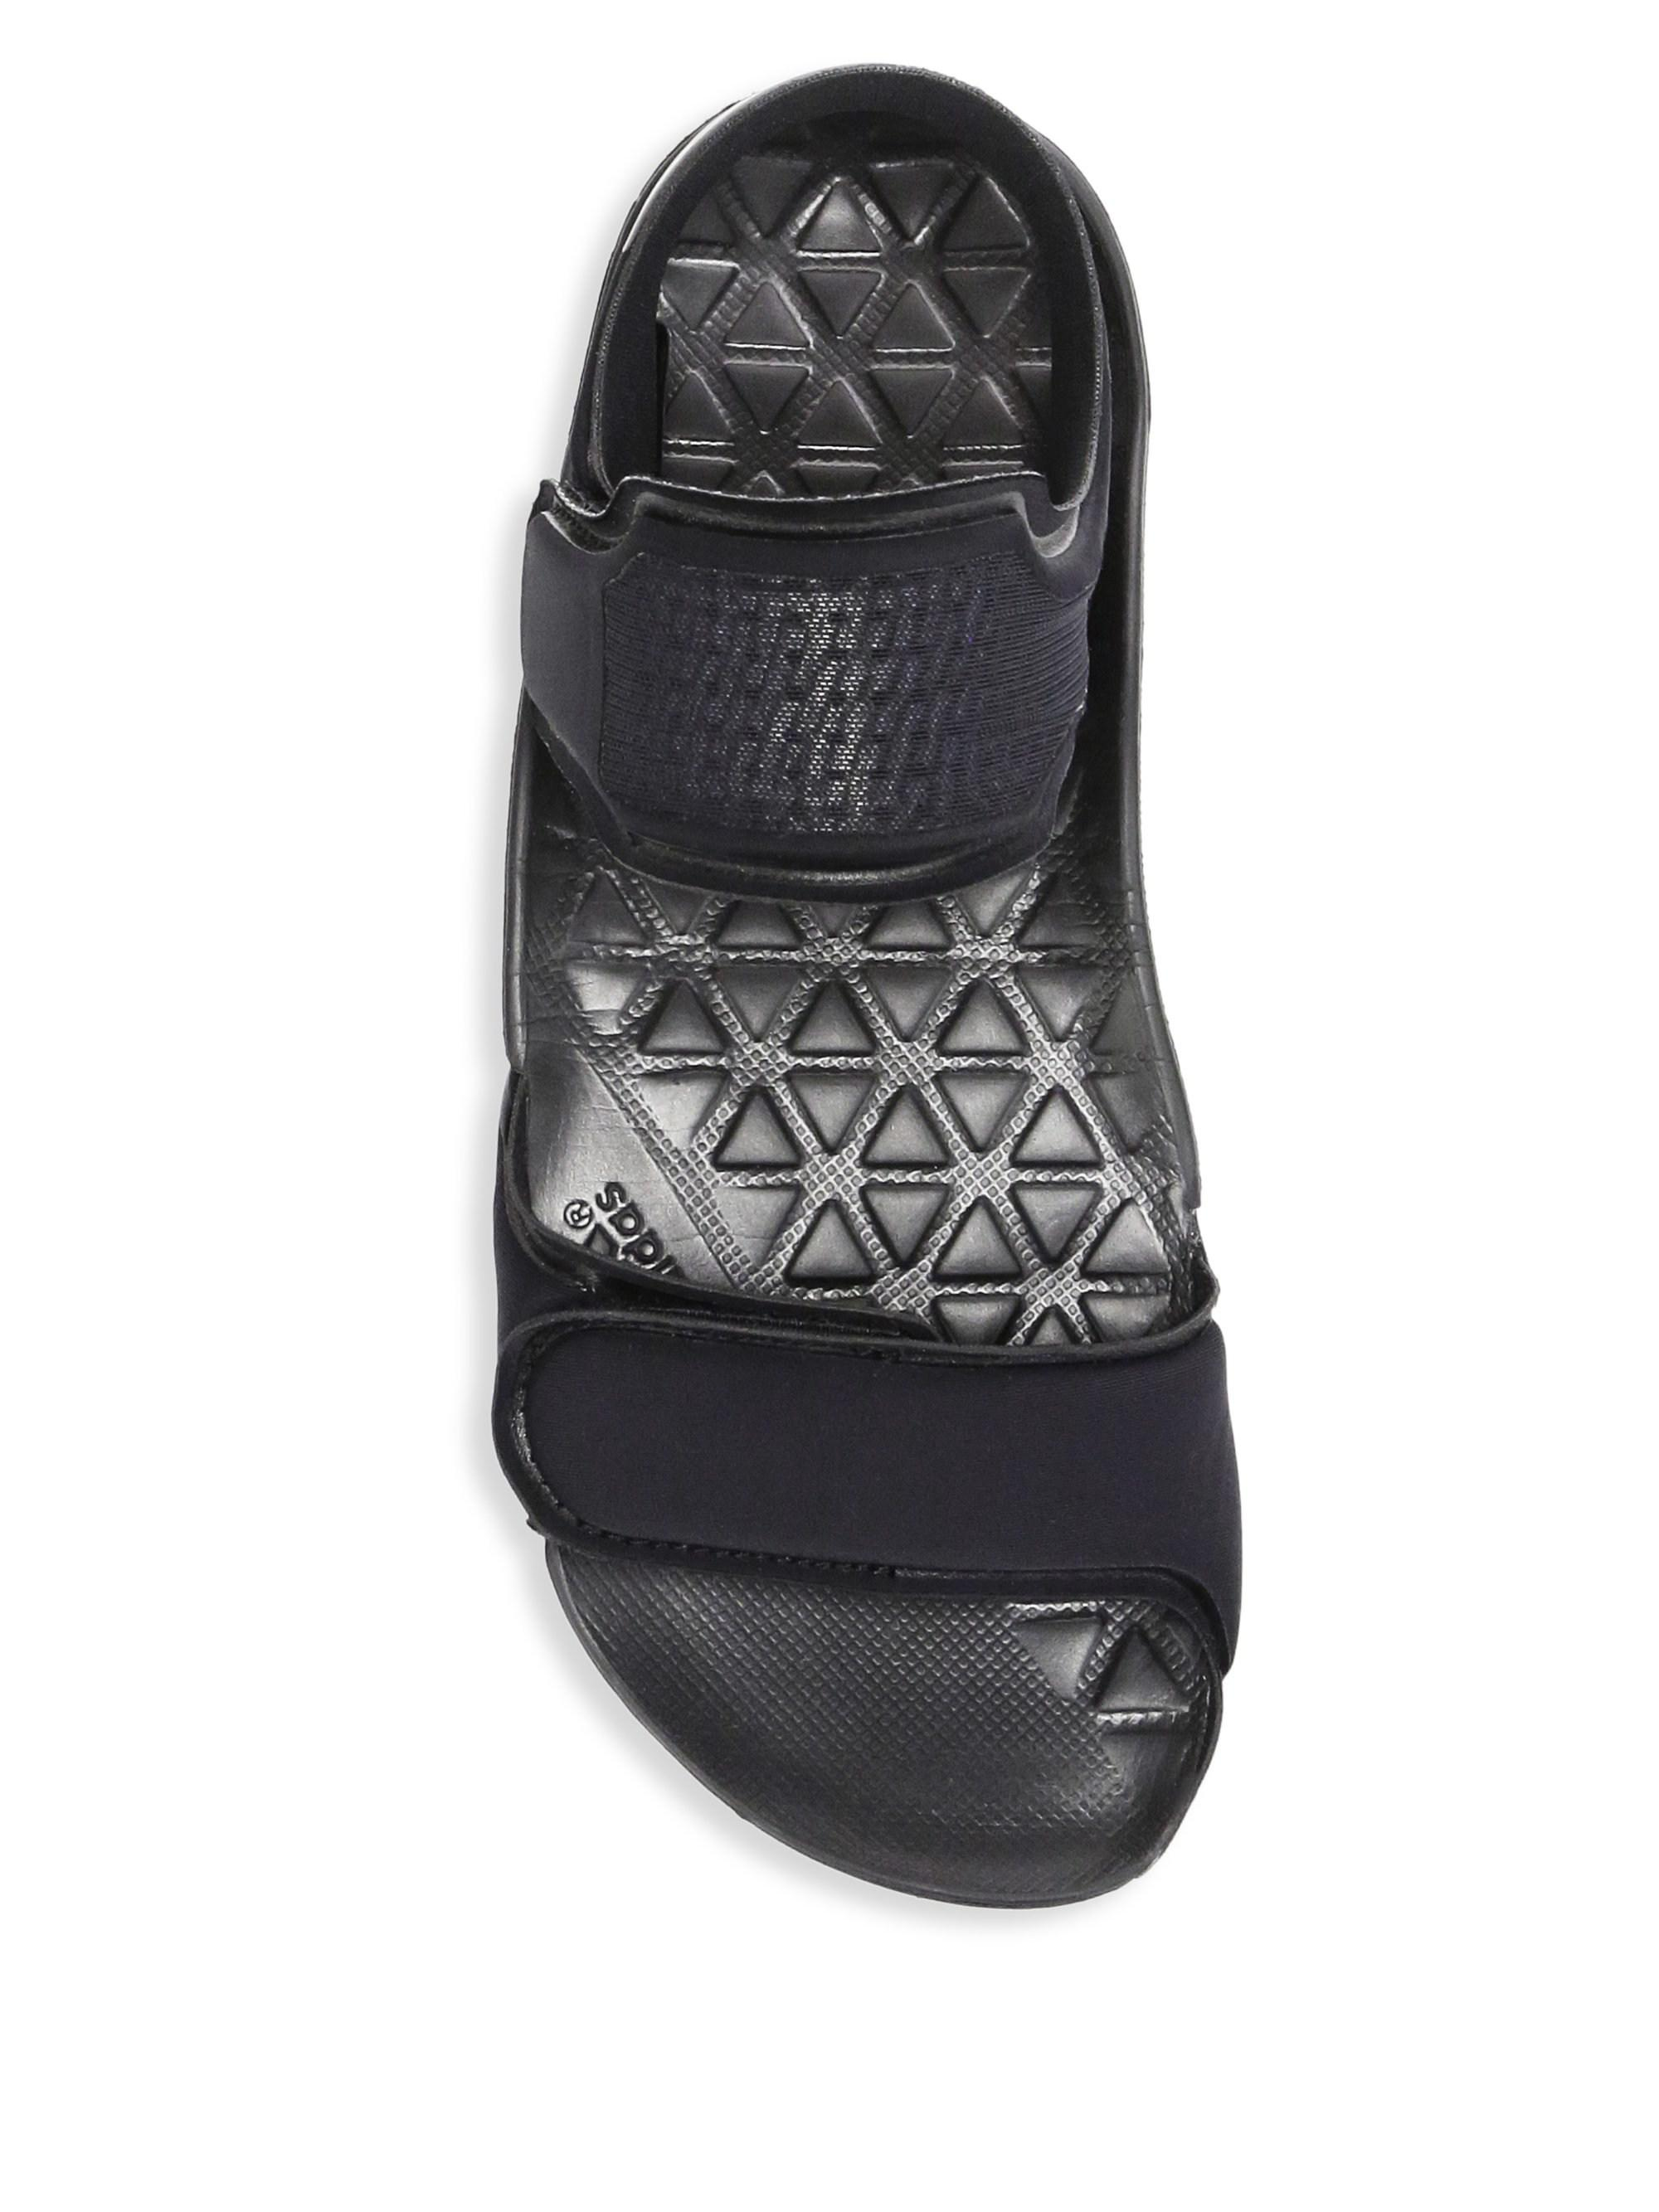 8276550863ca Lyst - adidas By Stella McCartney Hikira Nylon Grip-tape Sandals in ...